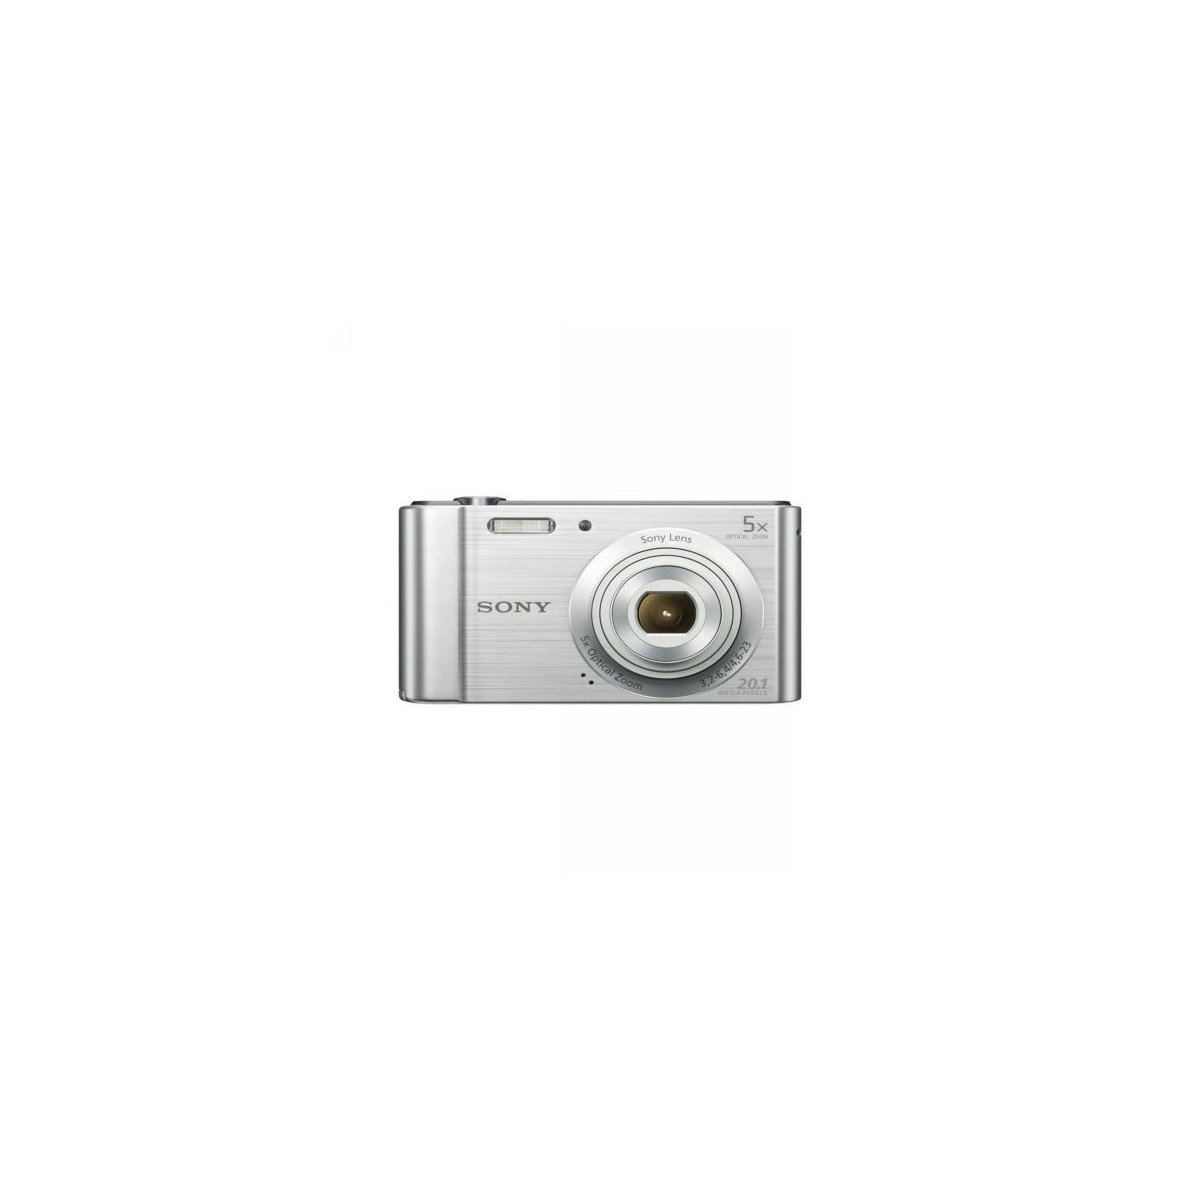 Cámara Digital Sony Cyber-shot DSC-W800SCE3 Plata